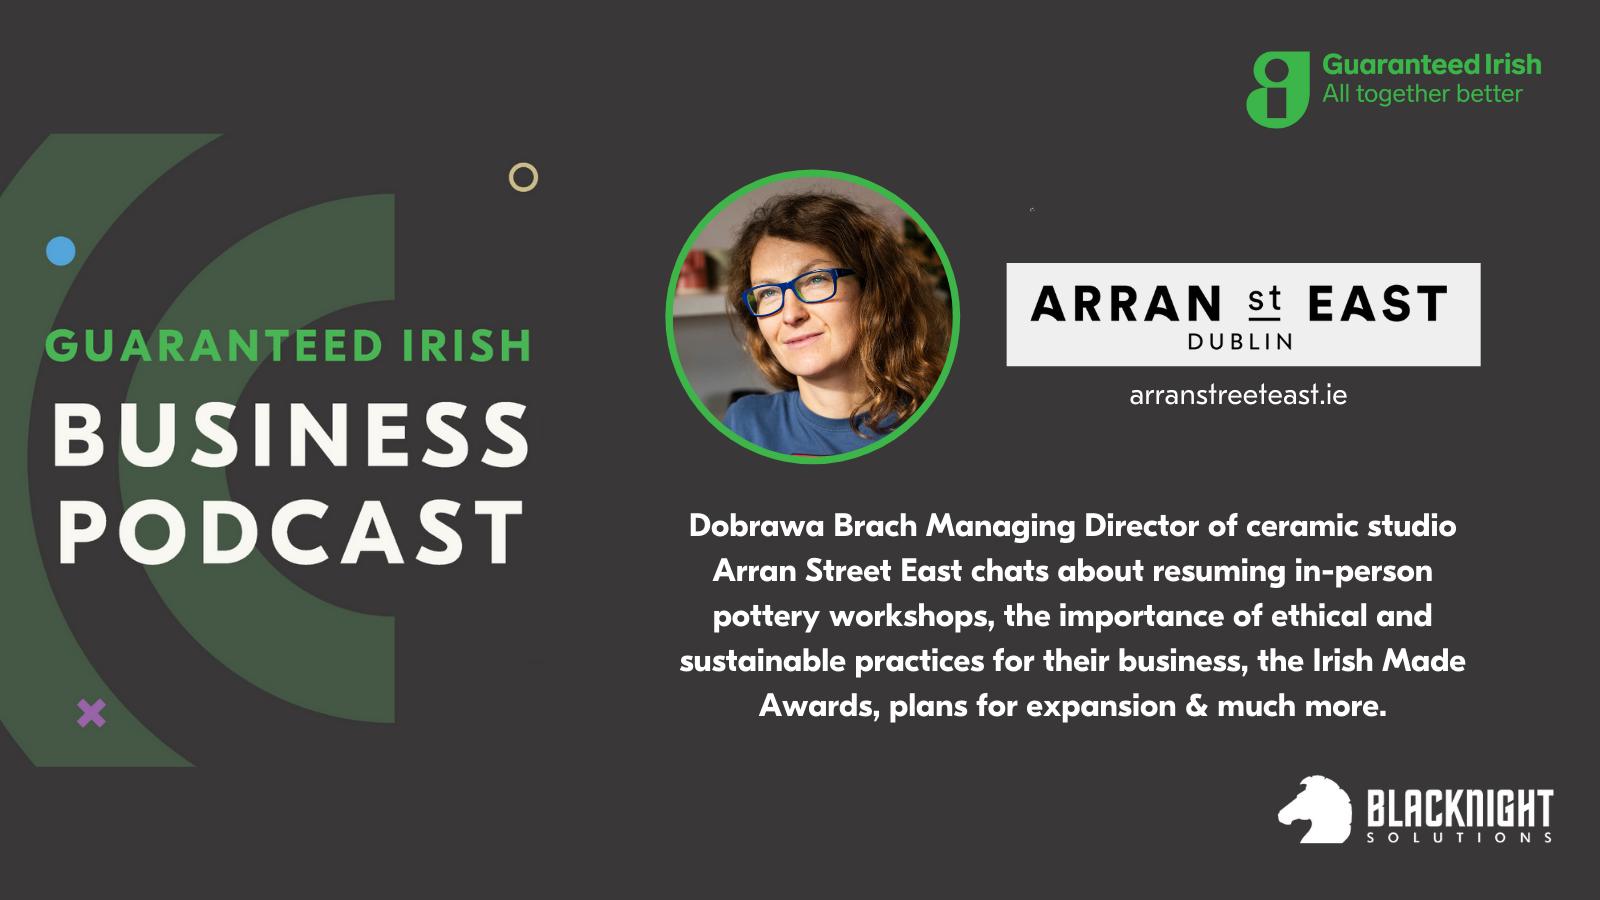 arran-st-east-podcast